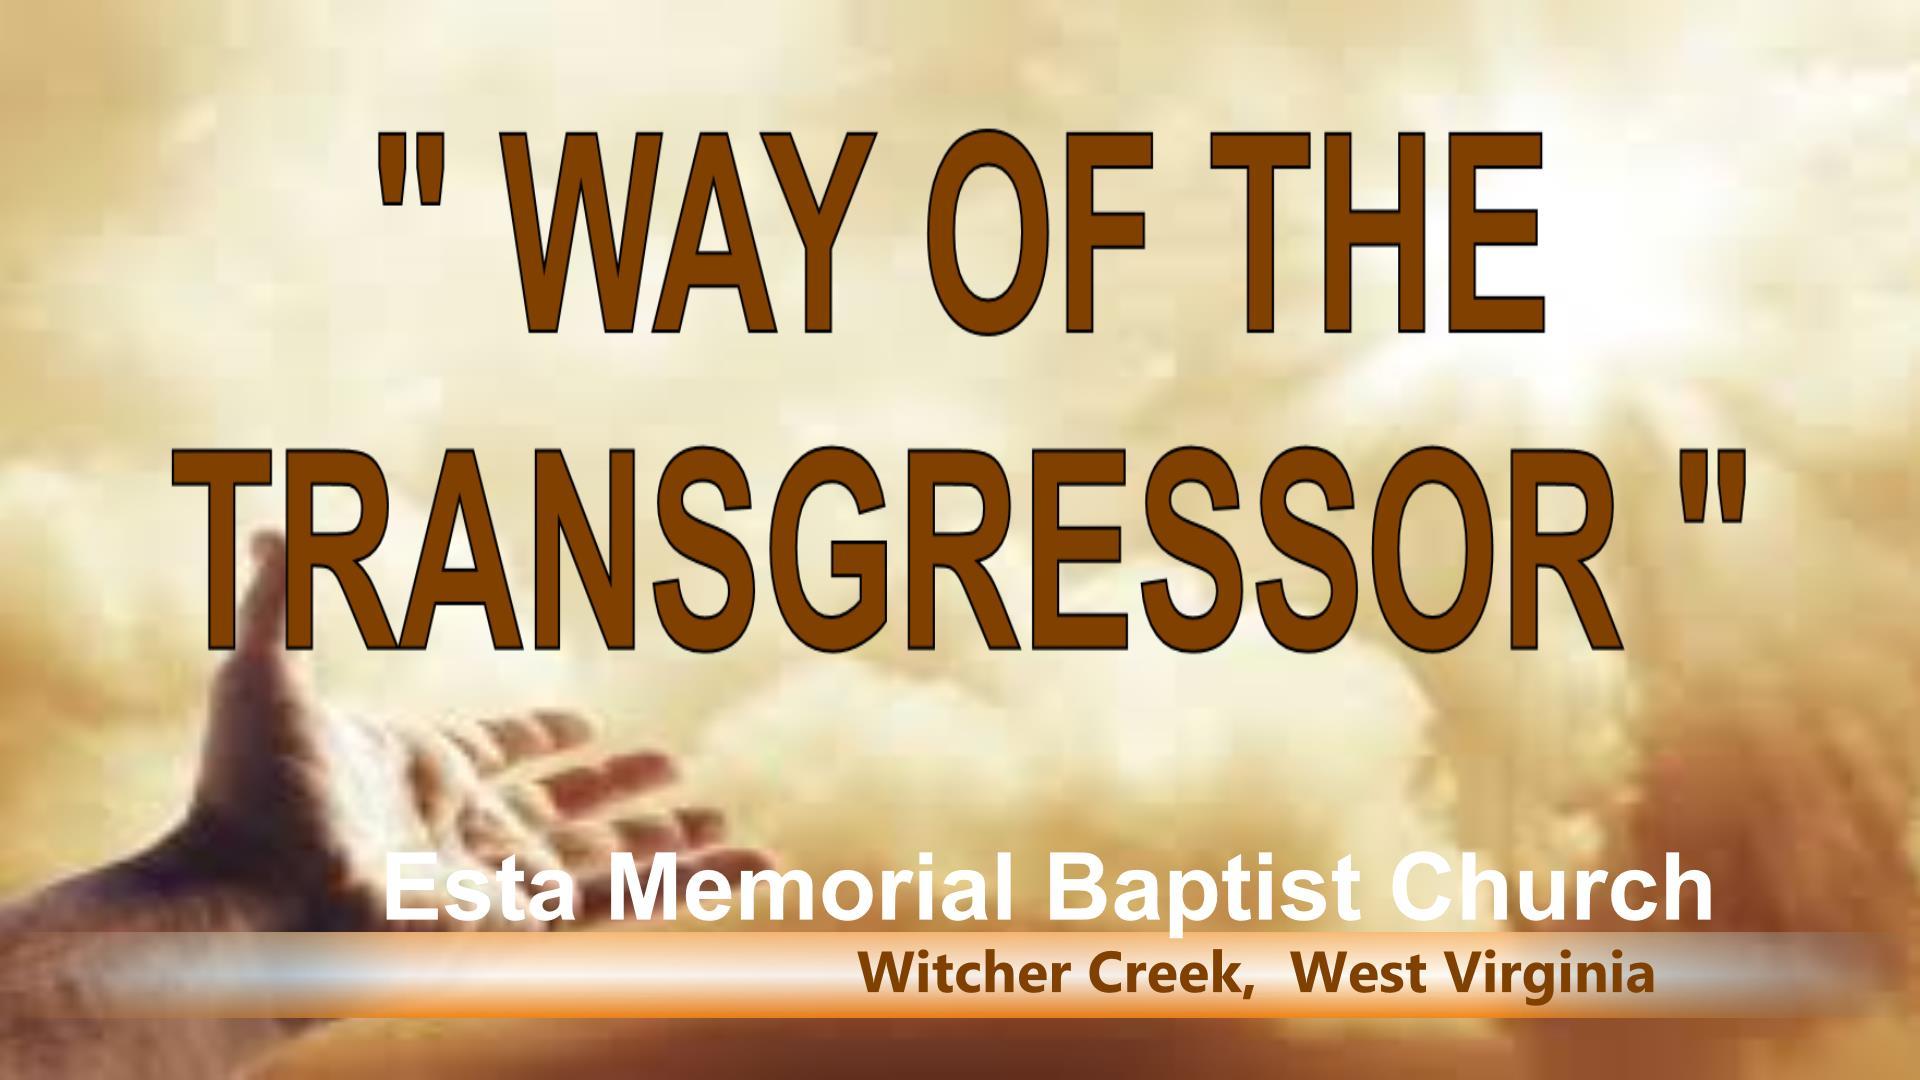 WAY OF THE TRANSGRESSOR